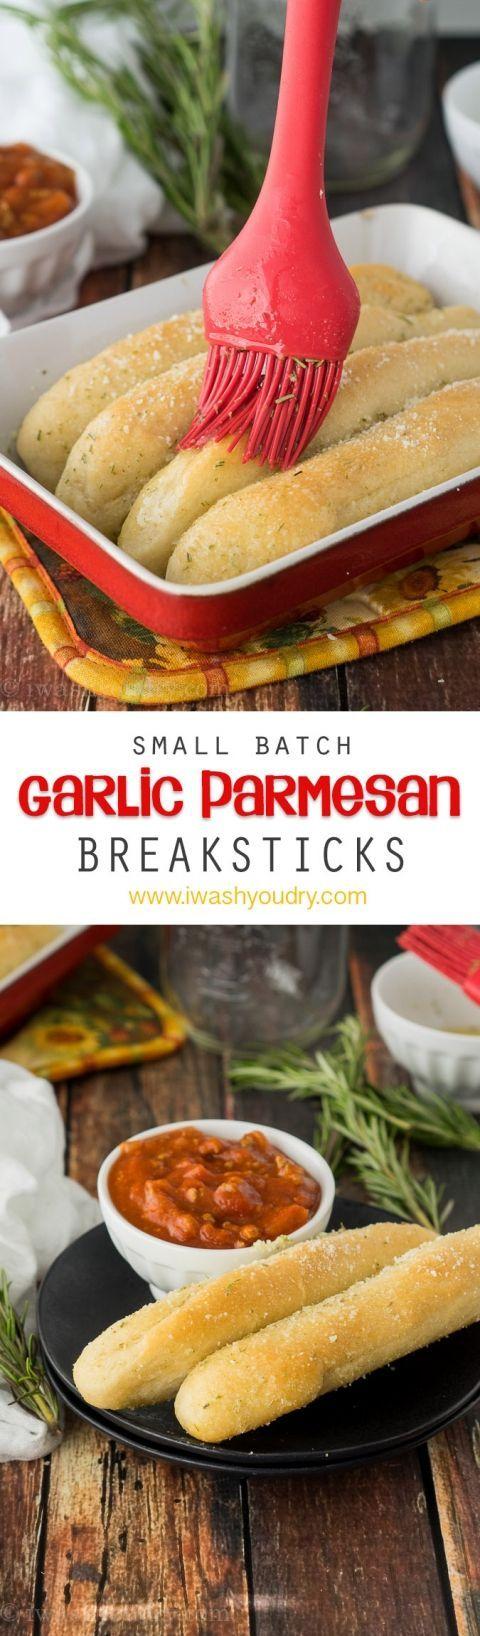 Small Batch Garlic Parmesan Breadsticks Recipe Cooking